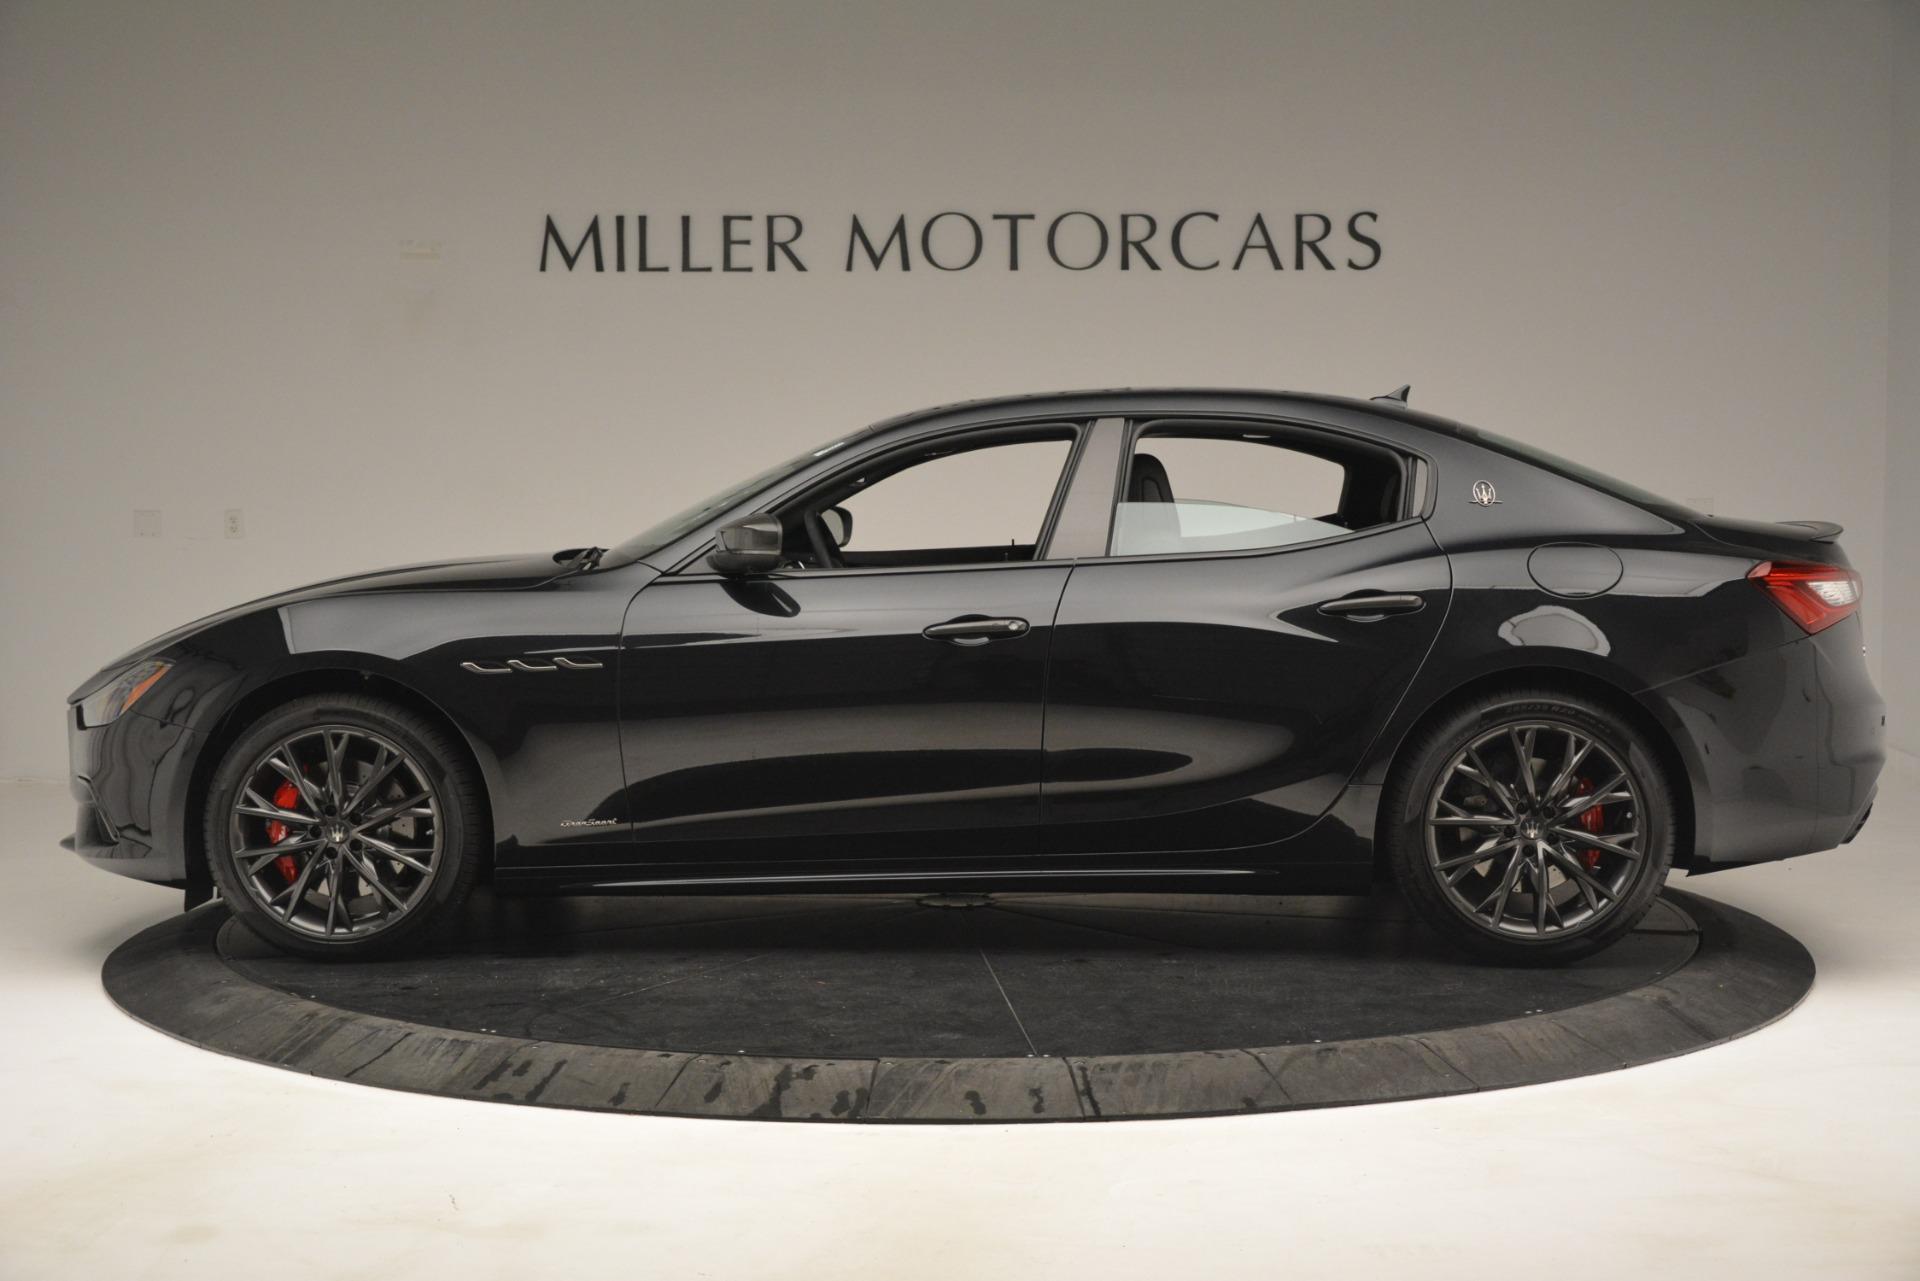 New 2019 Maserati Ghibli S Q4 GranSport For Sale In Westport, CT 2924_p3